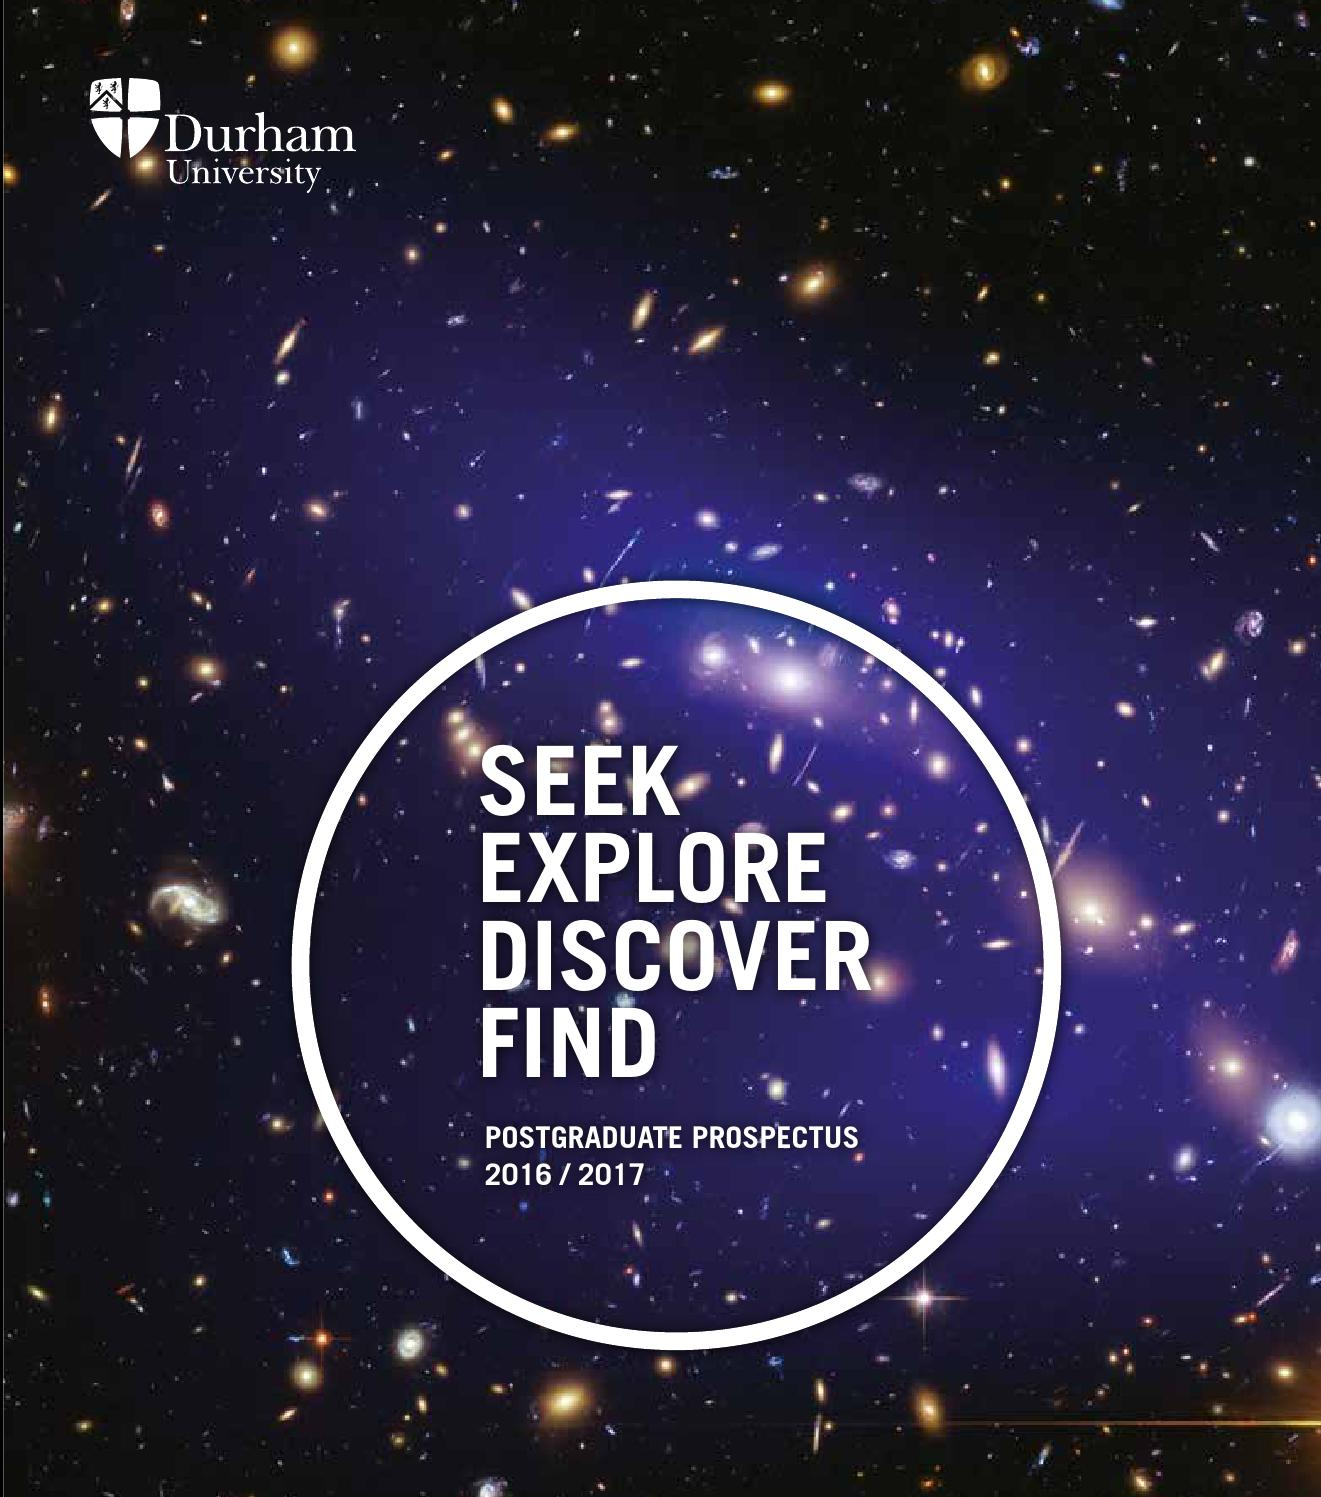 Postgraduate prospectus 2016 by durham university issuu - Durham university international office ...